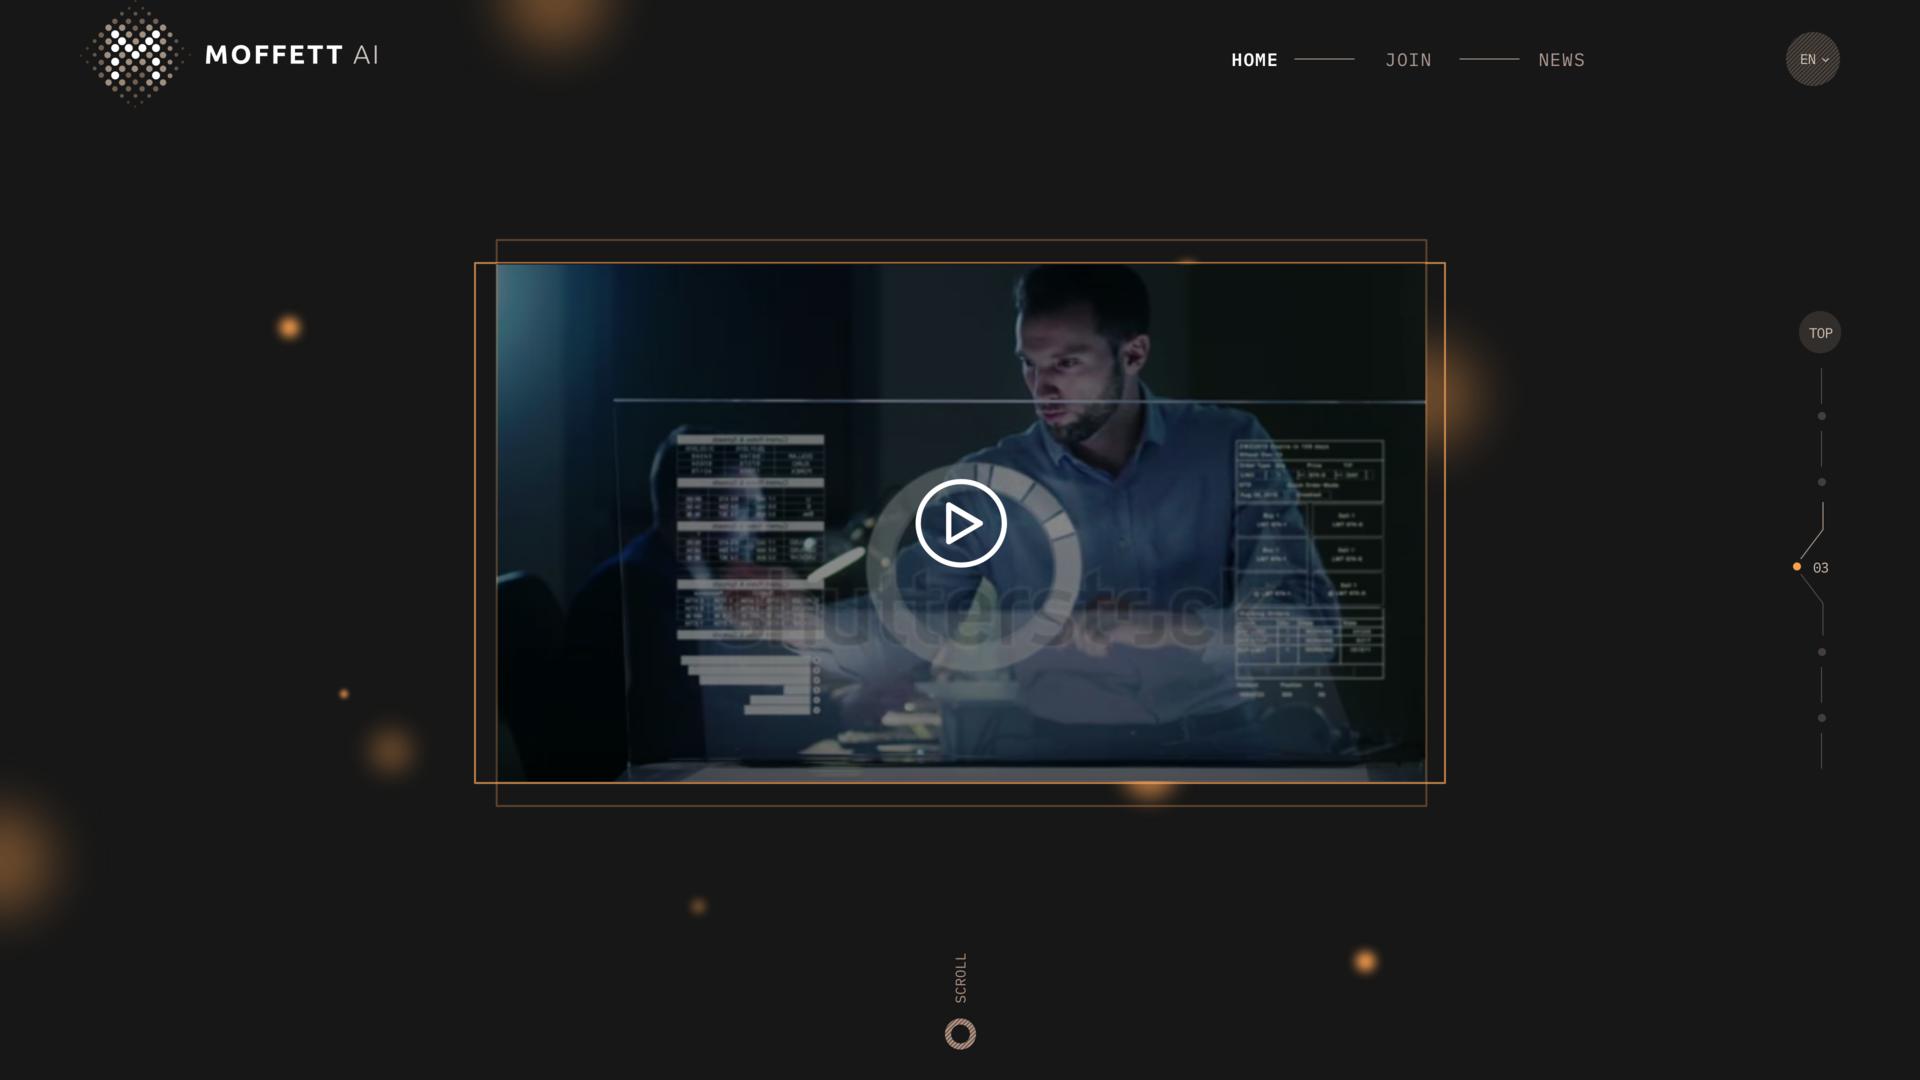 MOFFETT AI SAAS web design Project